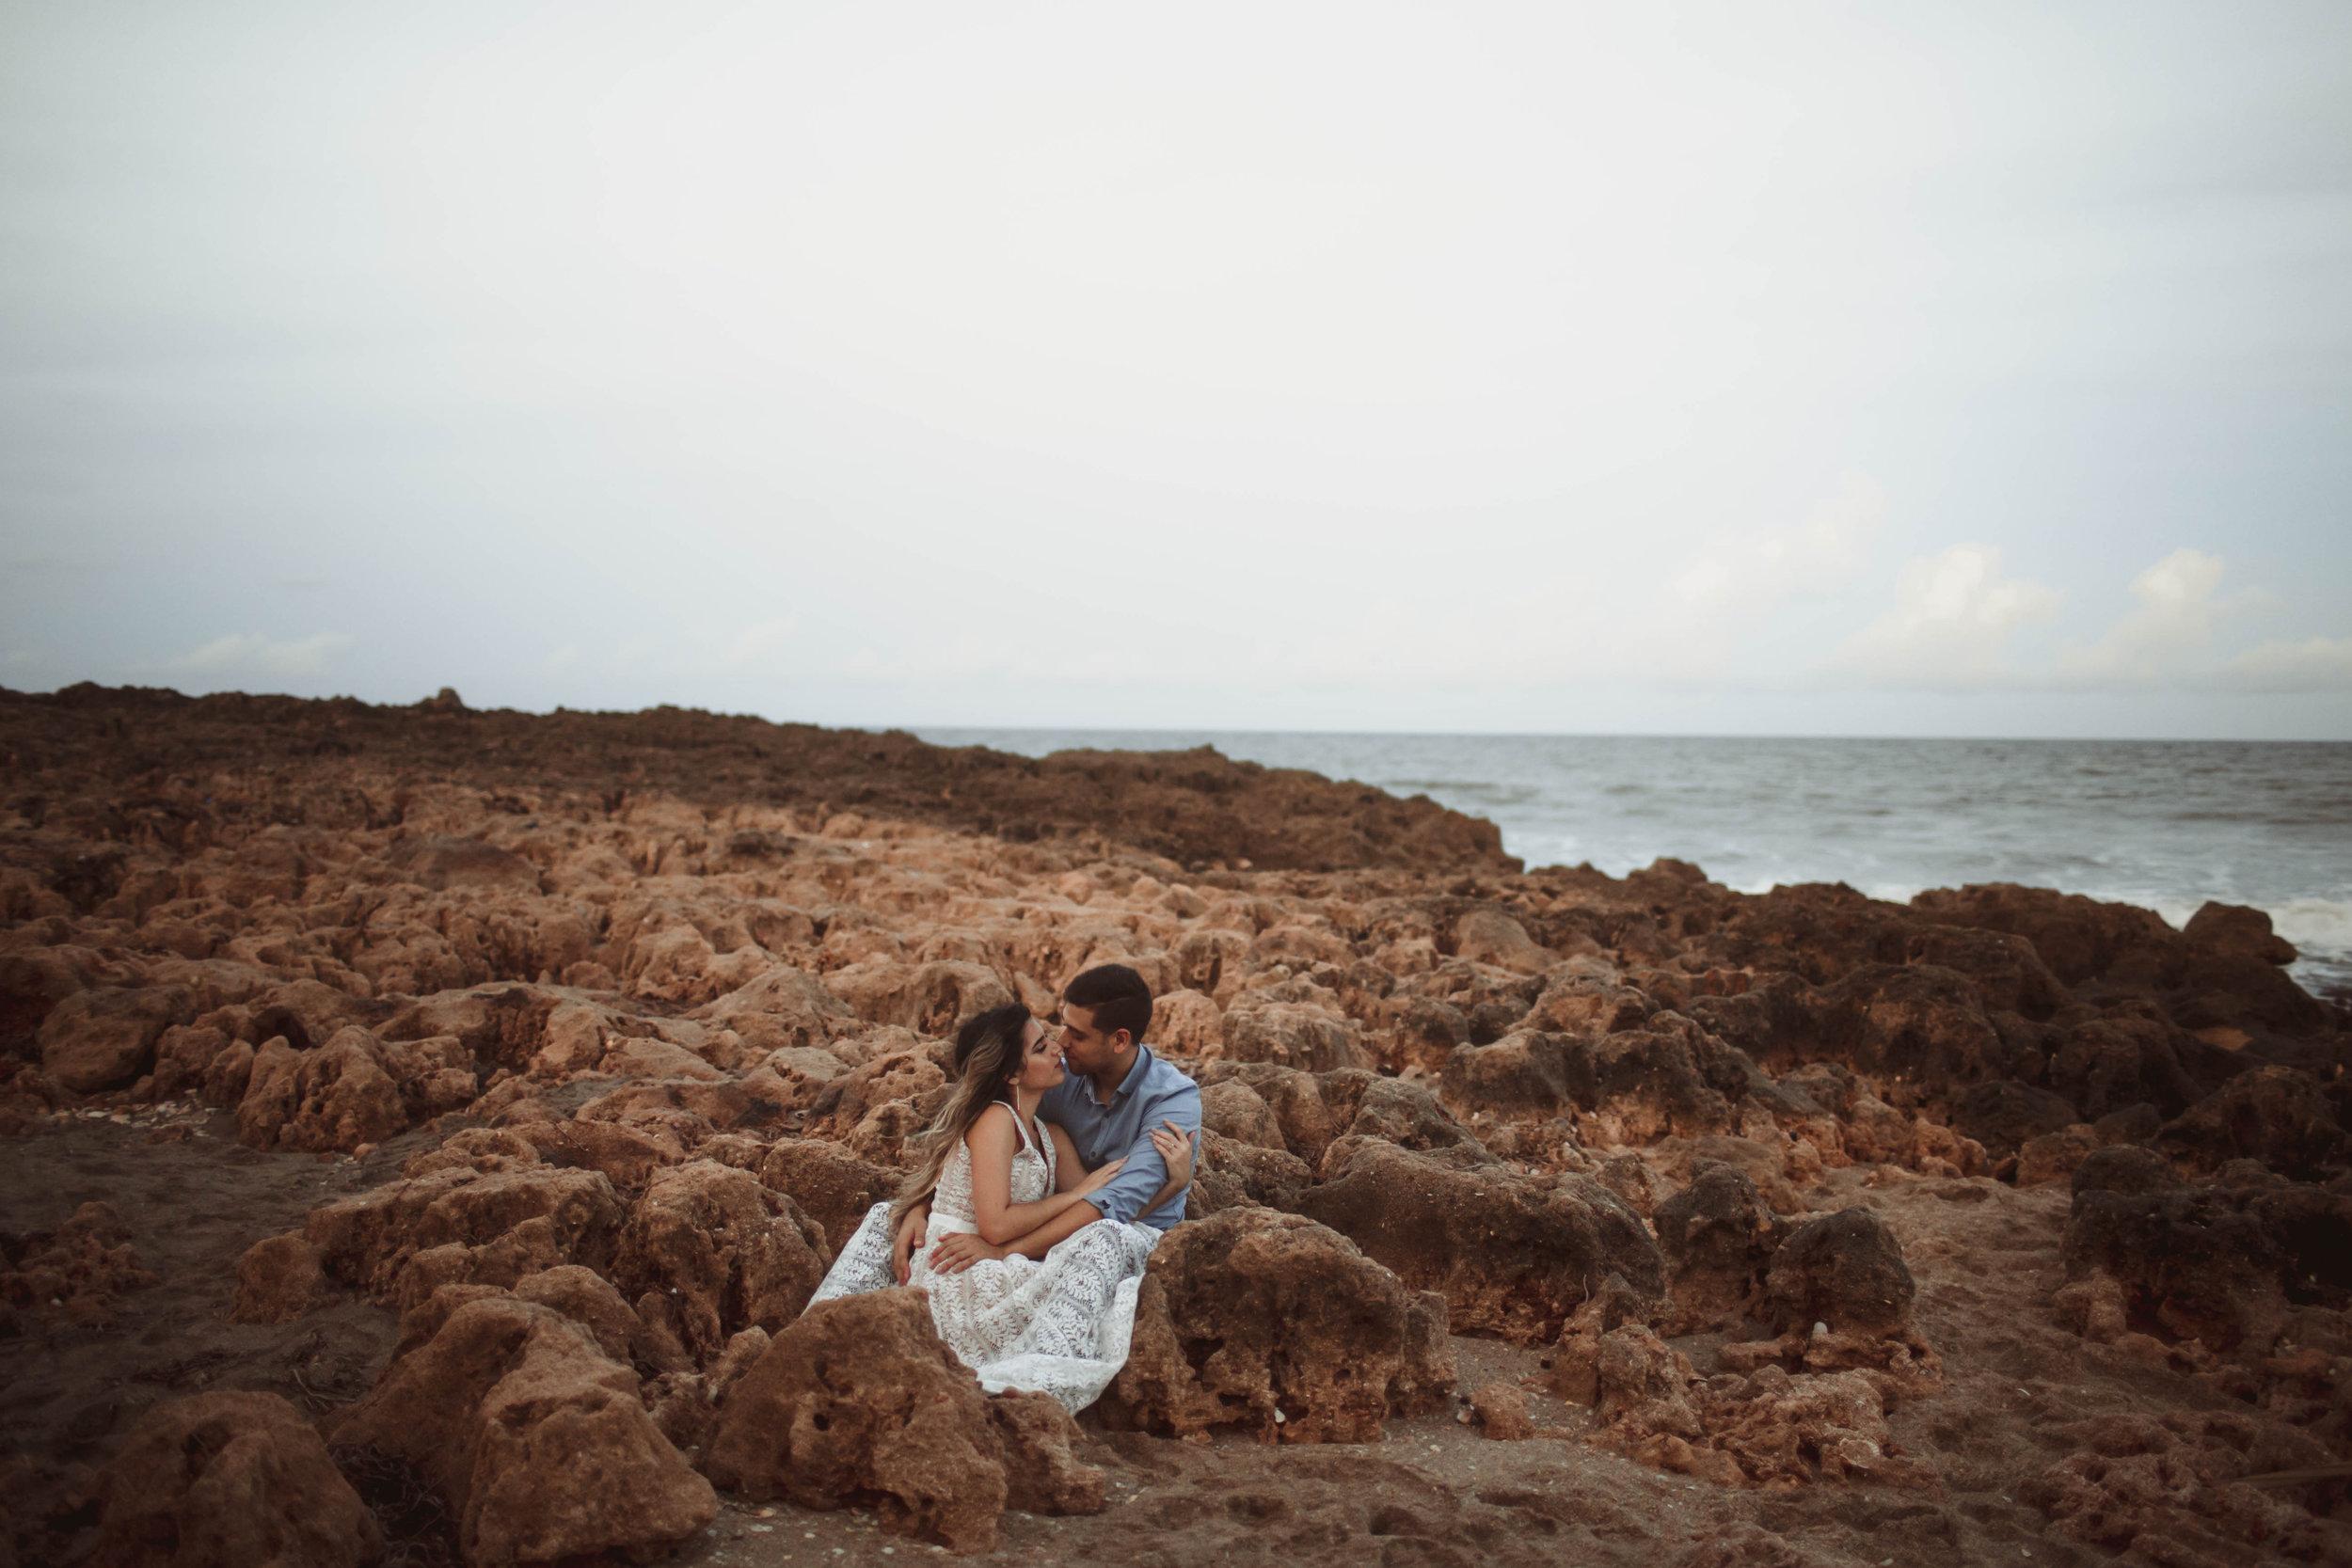 Engagement Session | Kiara Marie and Calixto |  © Vanessa Boy | vanessaboy.com-264.jpg